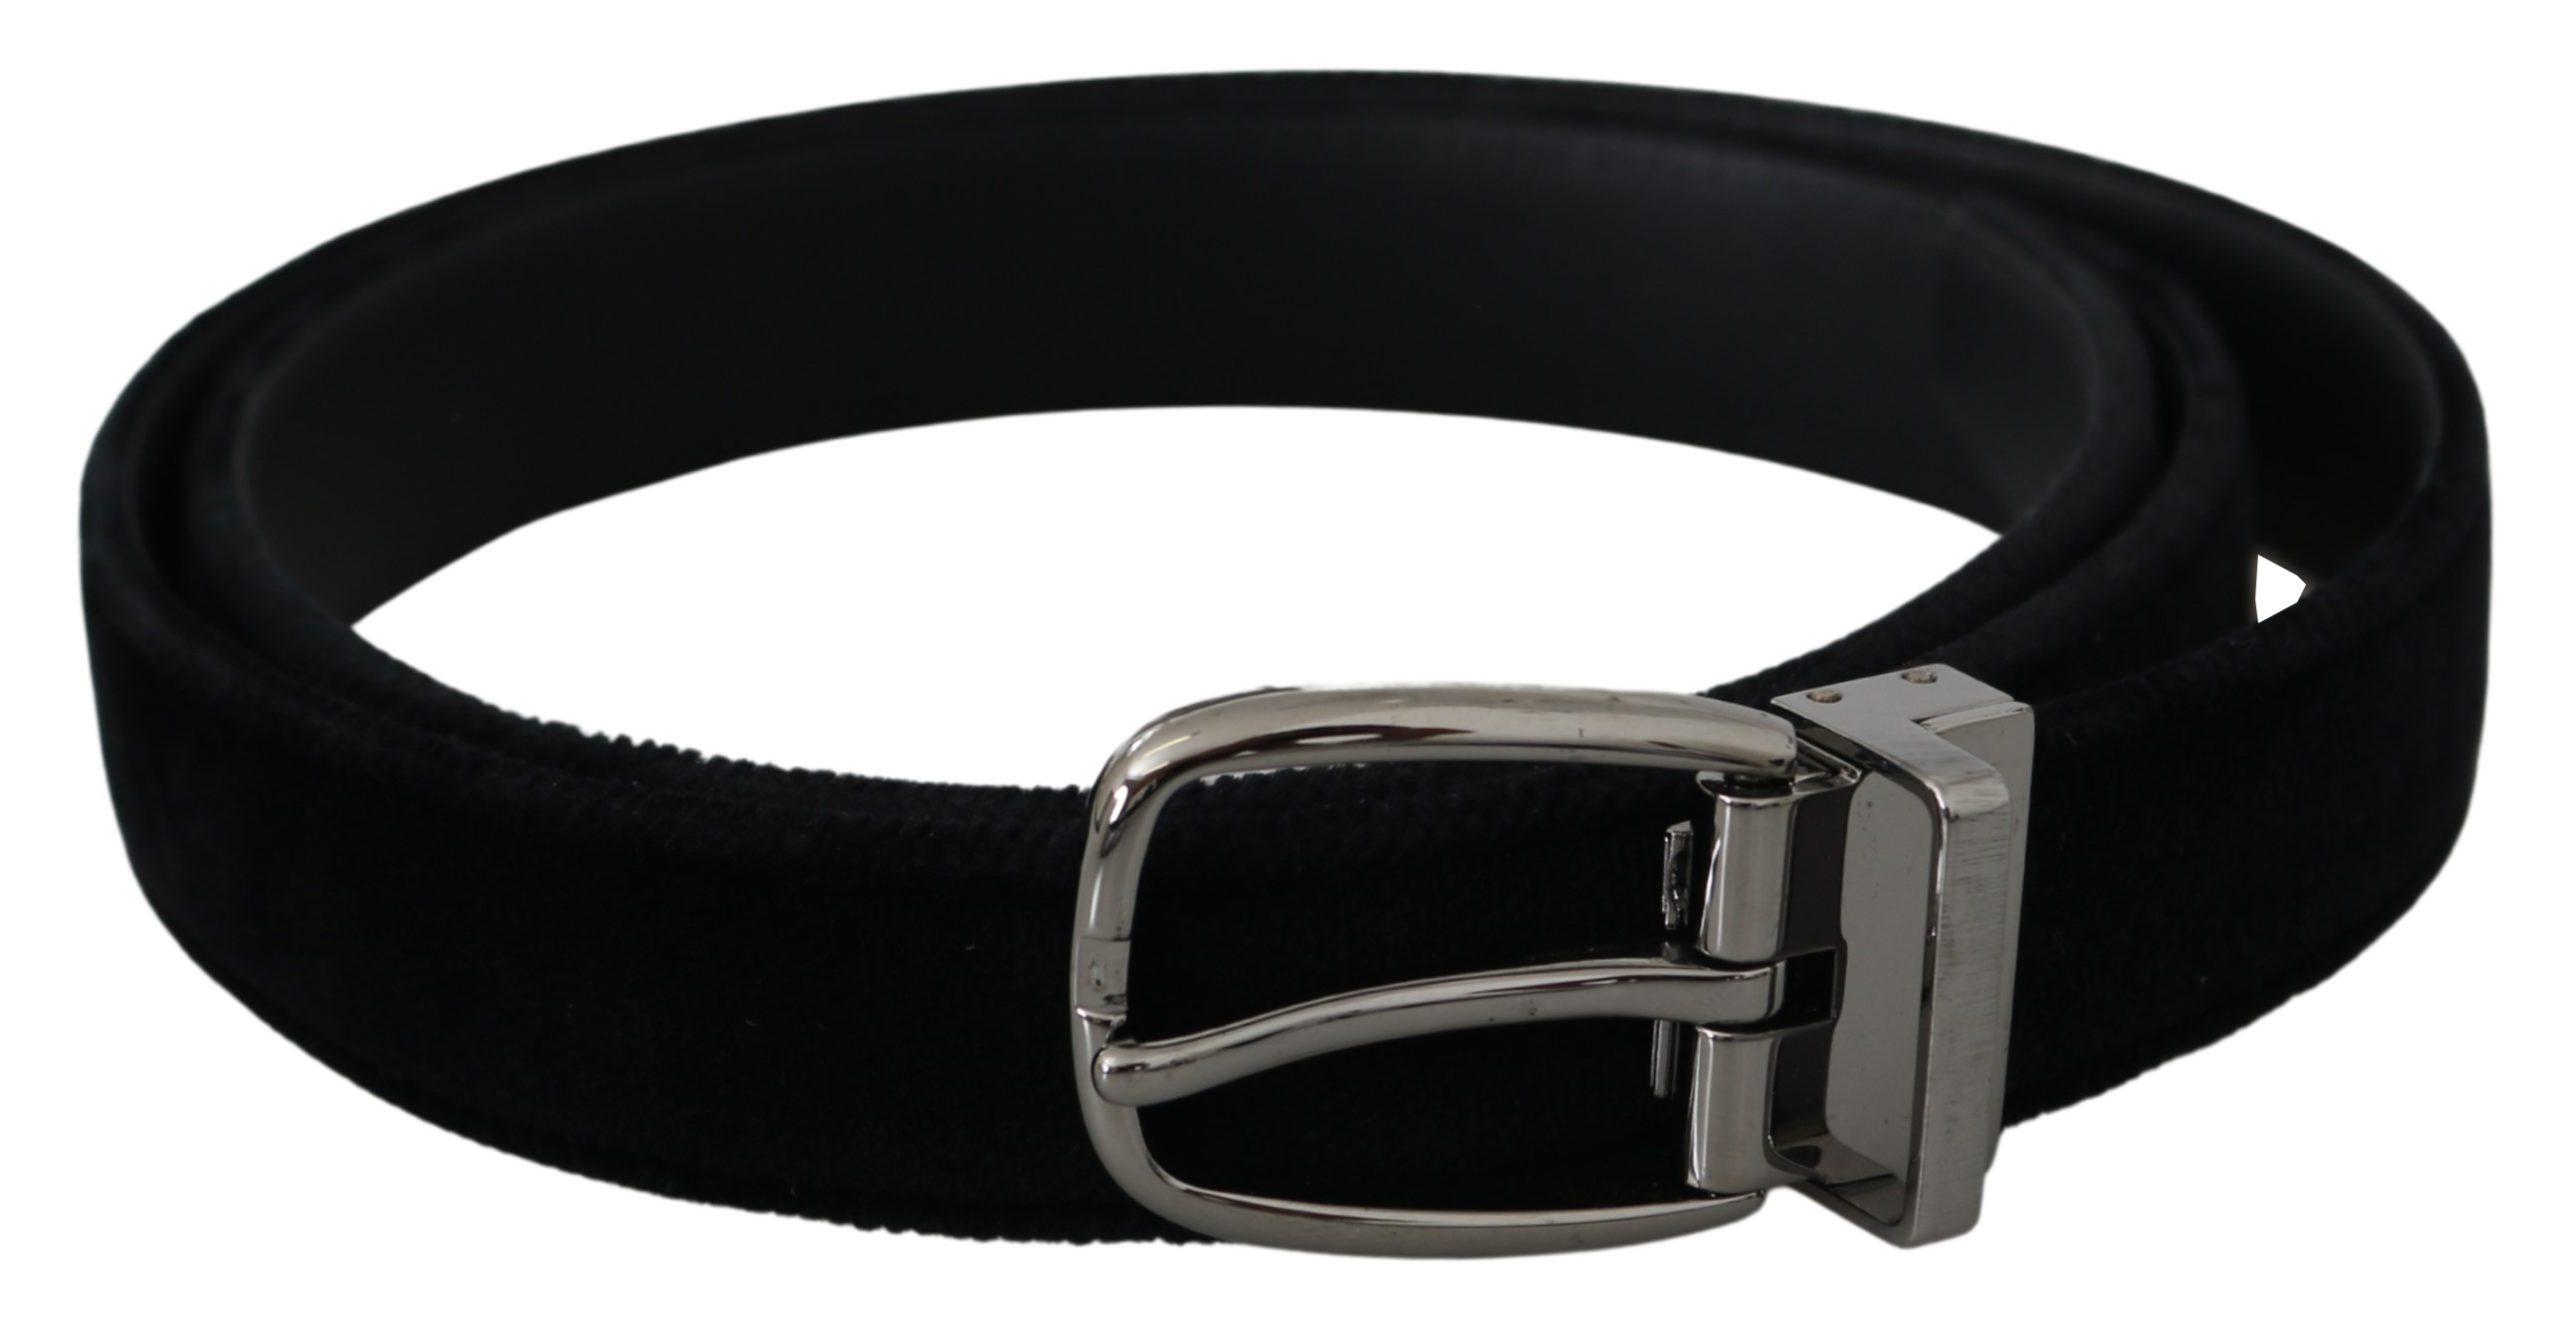 Dolce & Gabbana Men's Velvet Silver Oval Buckle Belt Black BEL60884 - 95 cm / 38 Inches